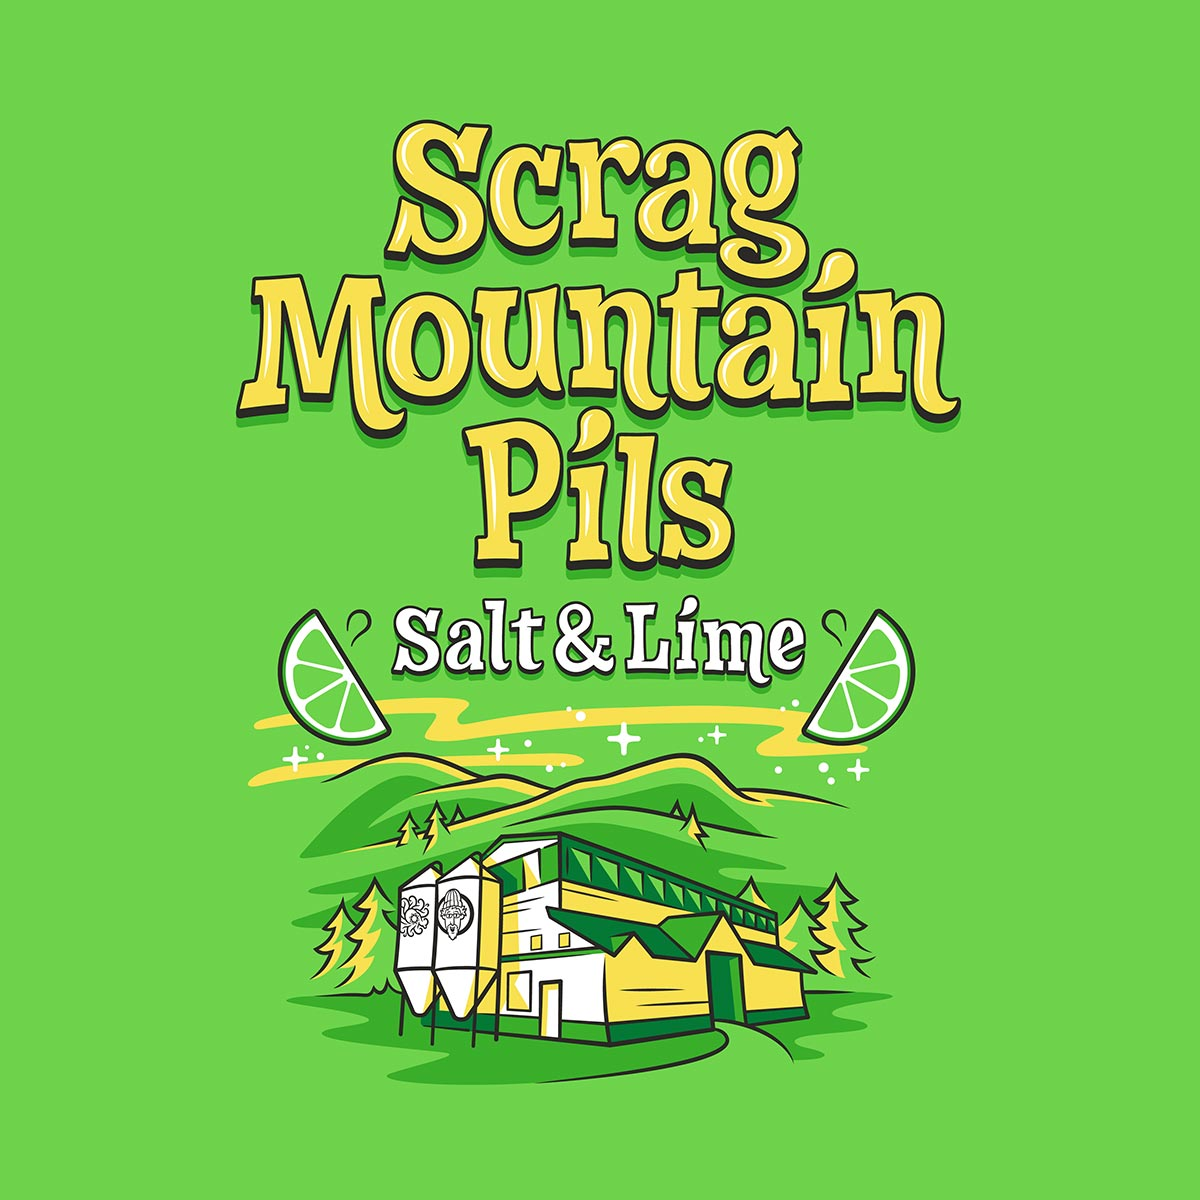 scrag-mountain-pils-slt-lime-lockup.jpg